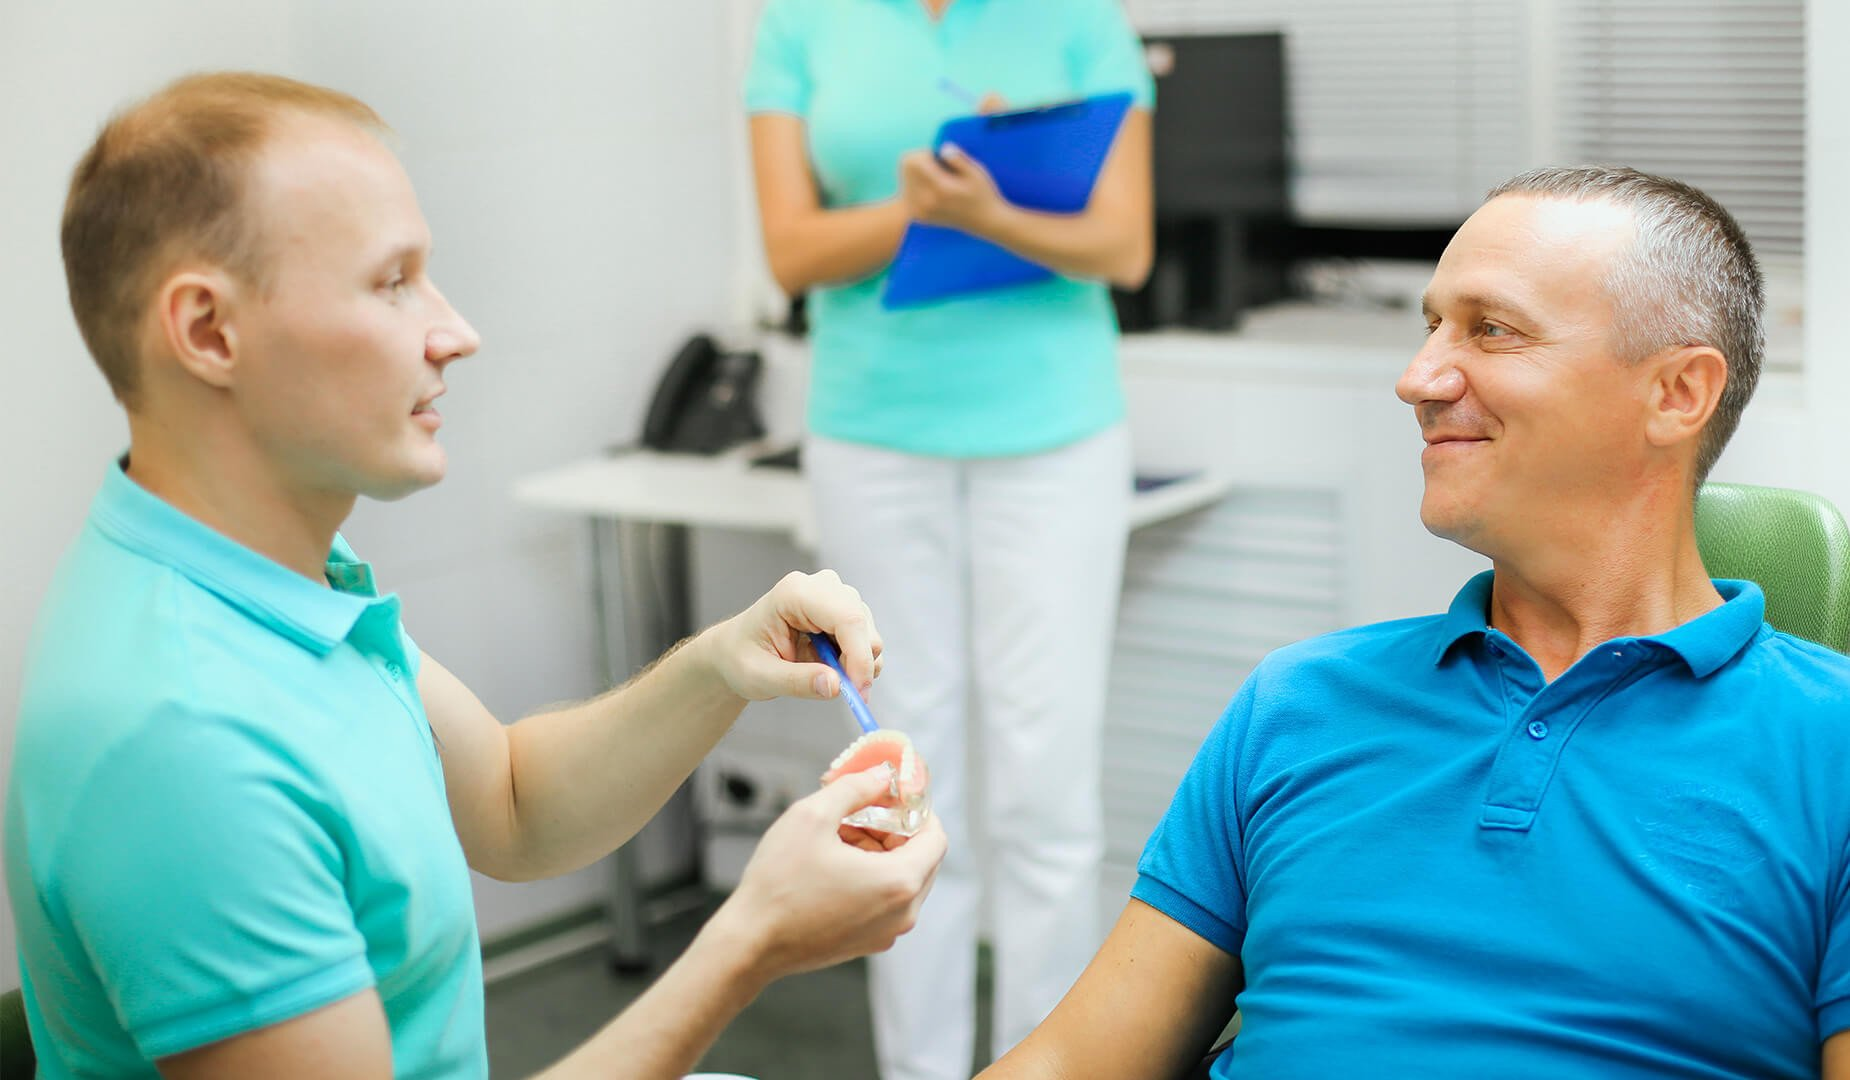 Пациент с врачом-имплантологом